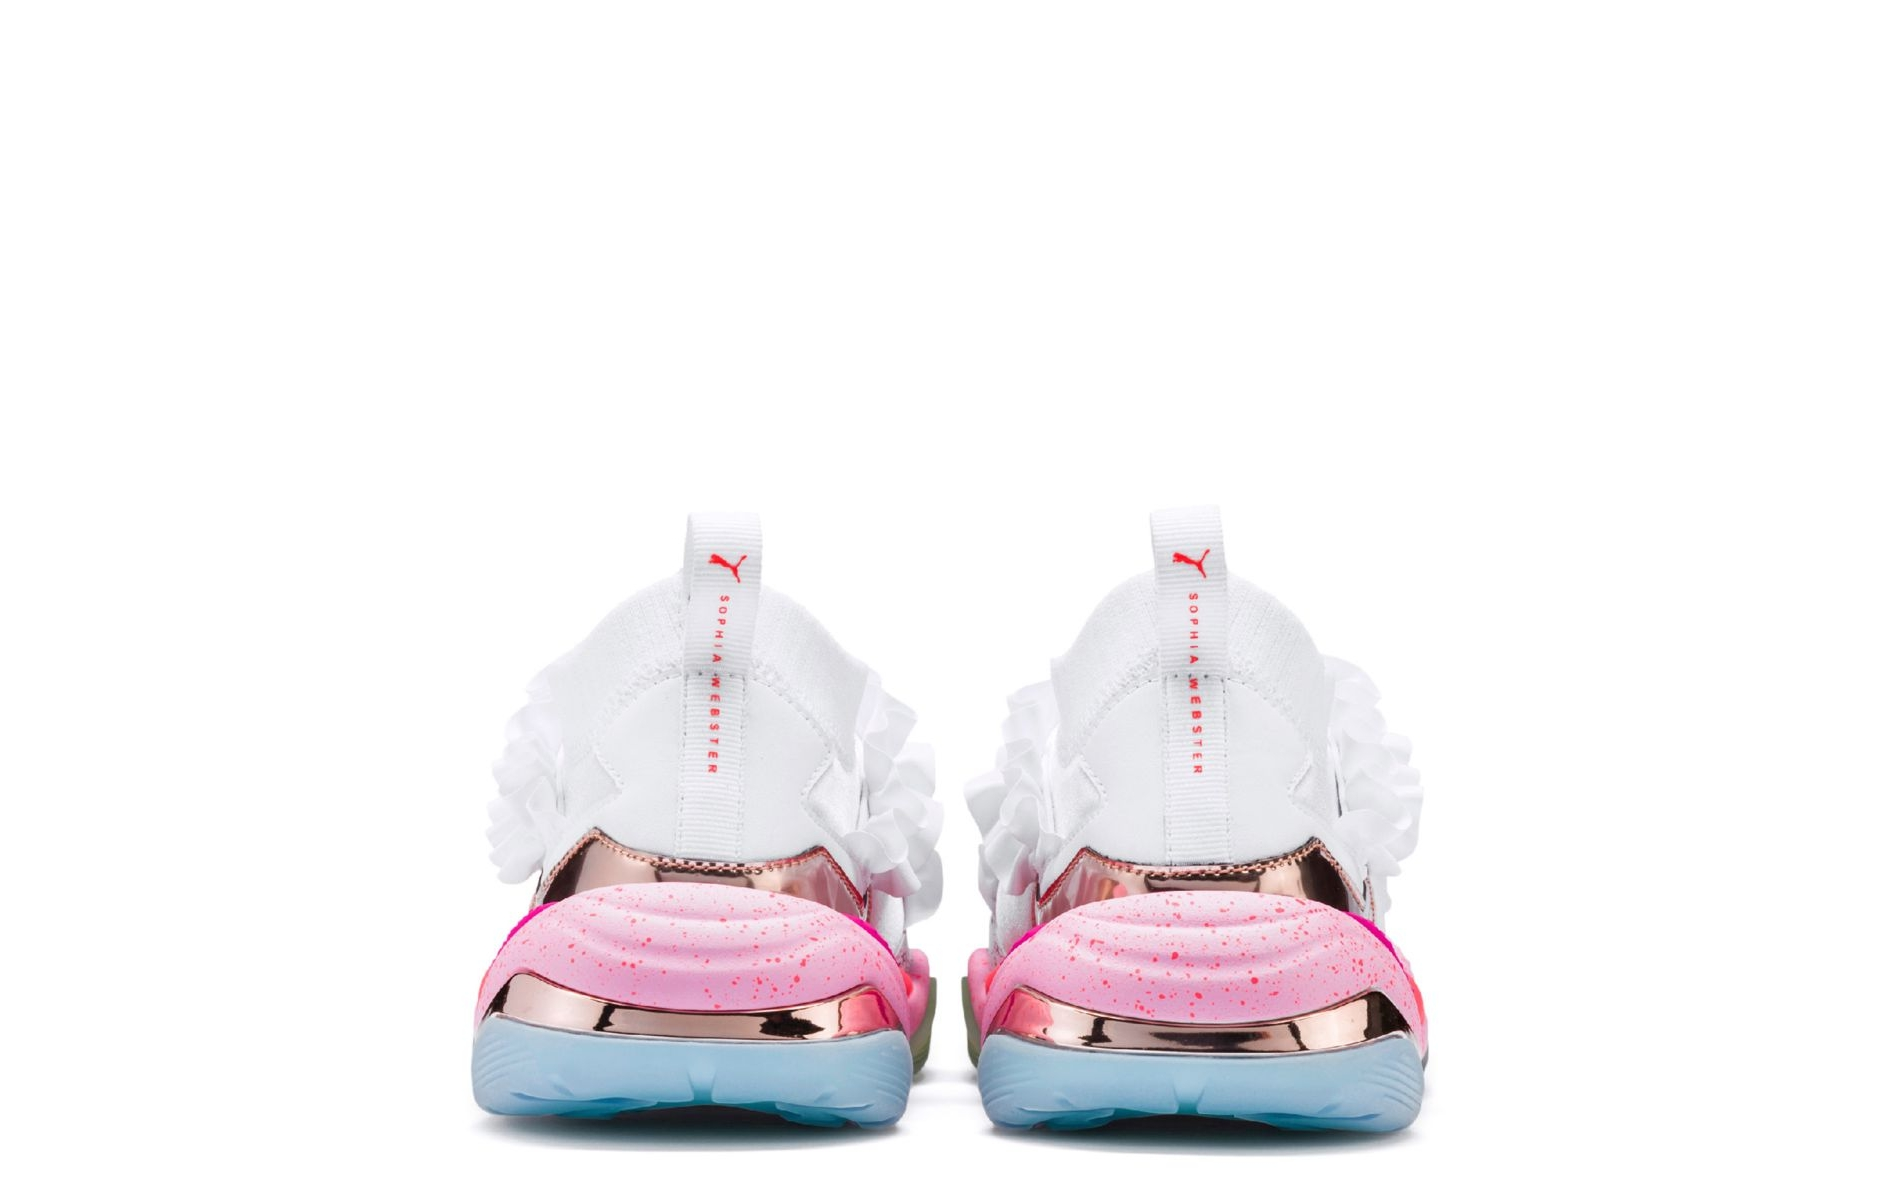 PUMA Thunder SOPHIA WEBSTER chaussures pour femmes